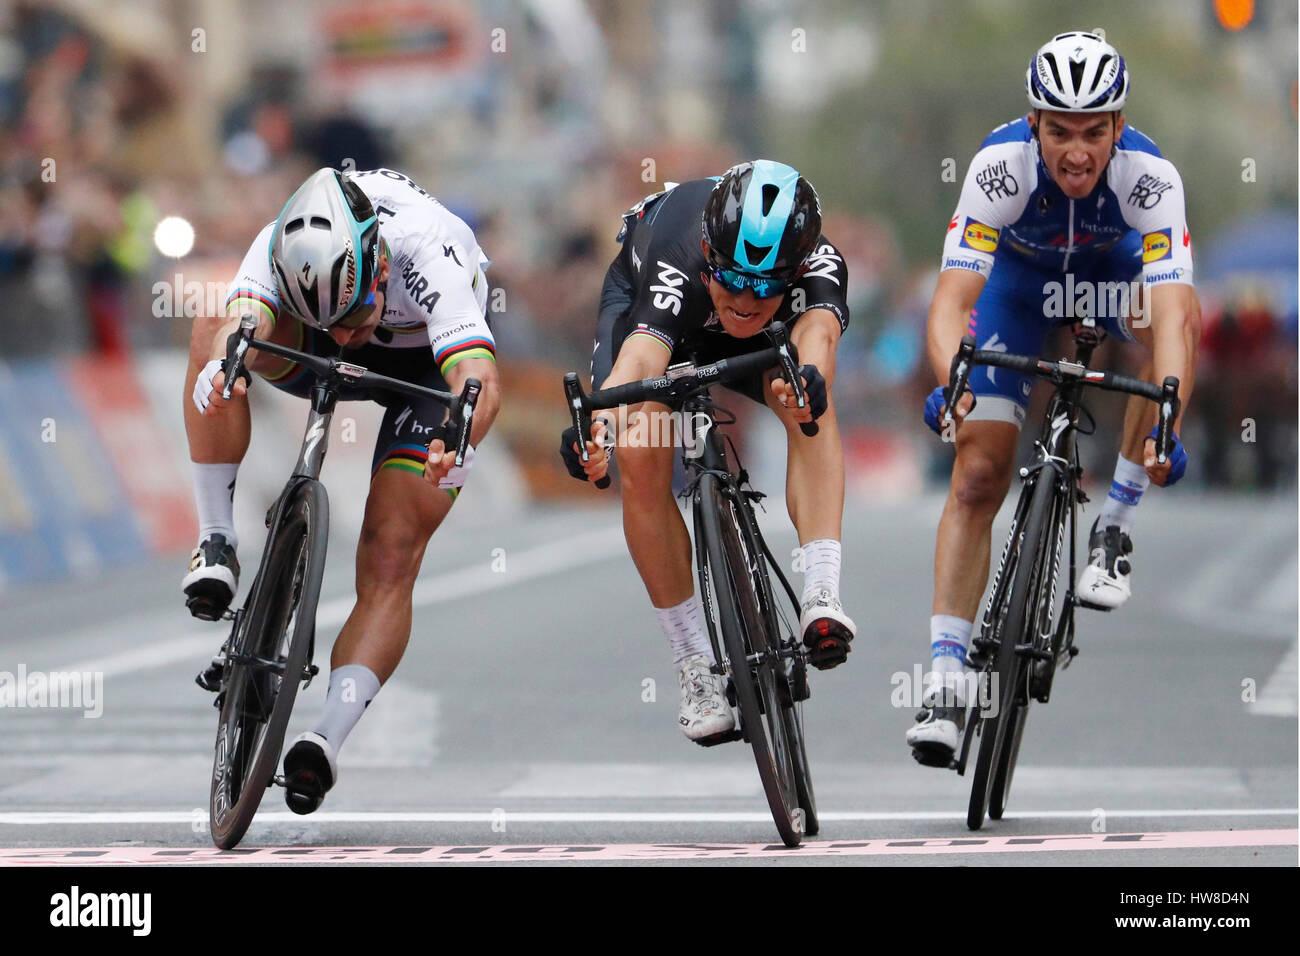 18 de marzo de 2017 108Milano - Sanremo 1ª : Michal KWIATKOWSKI (POL) Sky 2ª : Peter Sagan (ESK) Bora - Hansgrohe Foto de stock